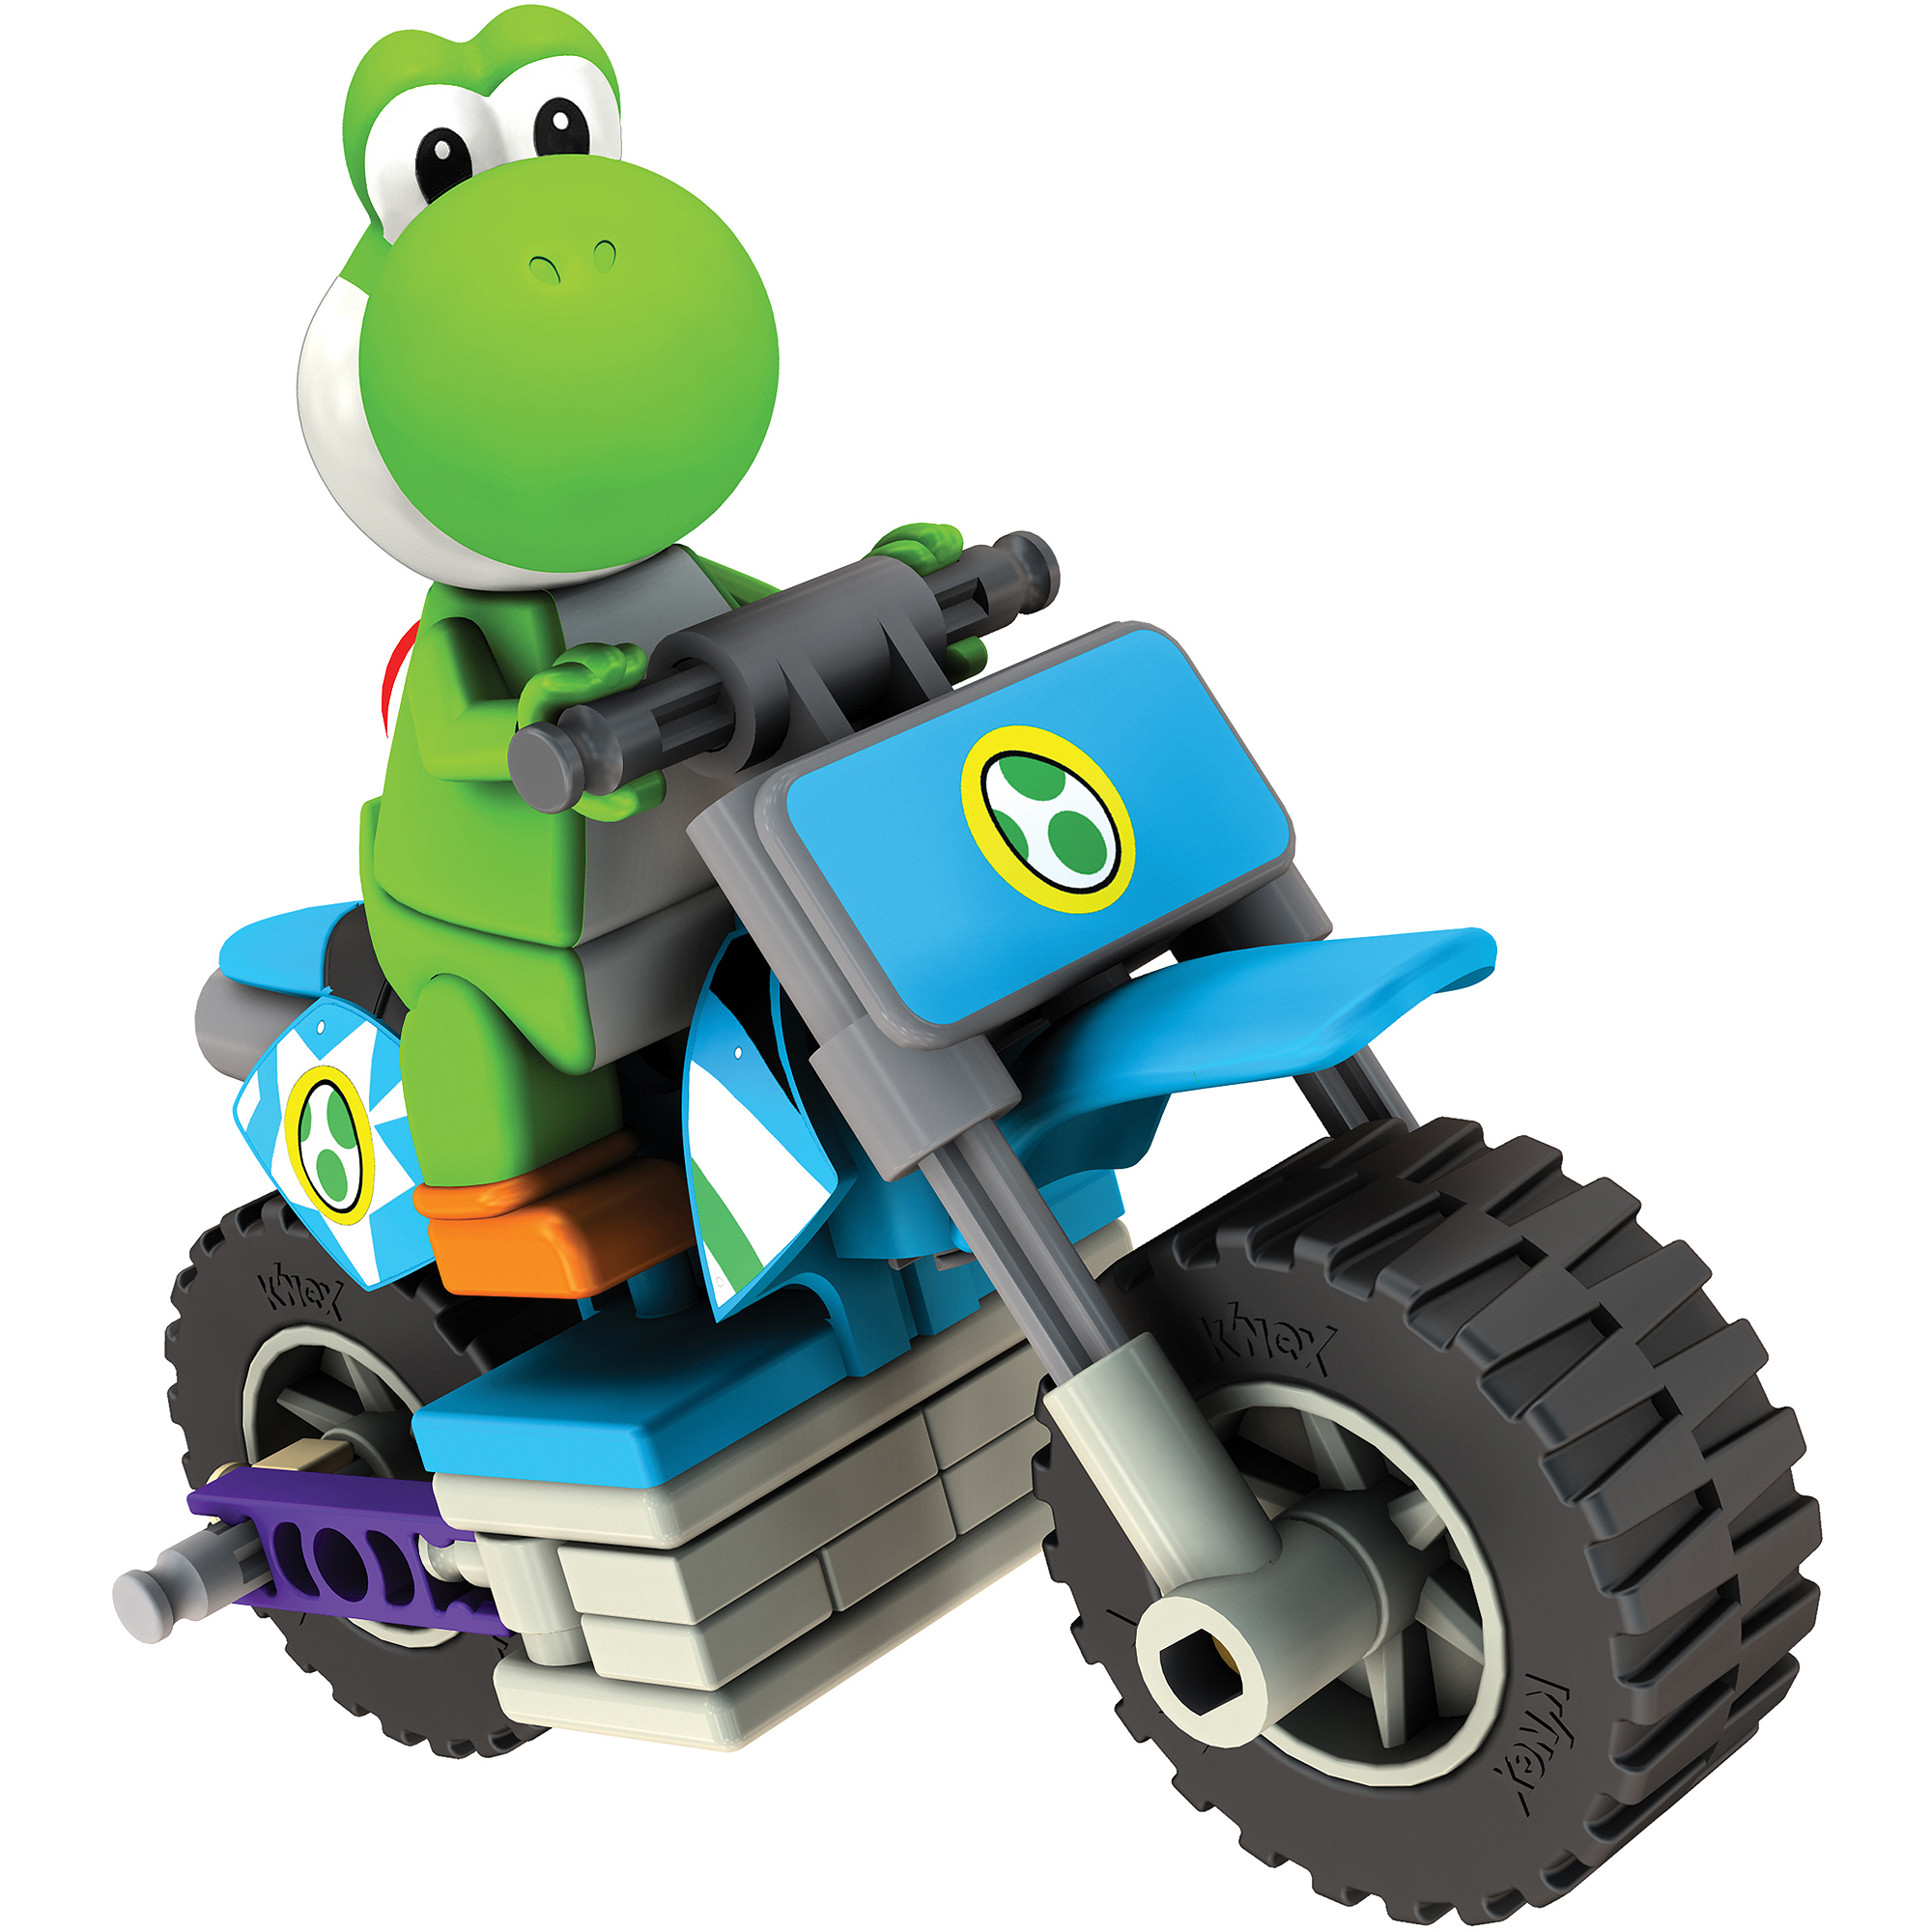 K'NEX Mario Kart Wii Building Set: Yoshi with Standard Bike